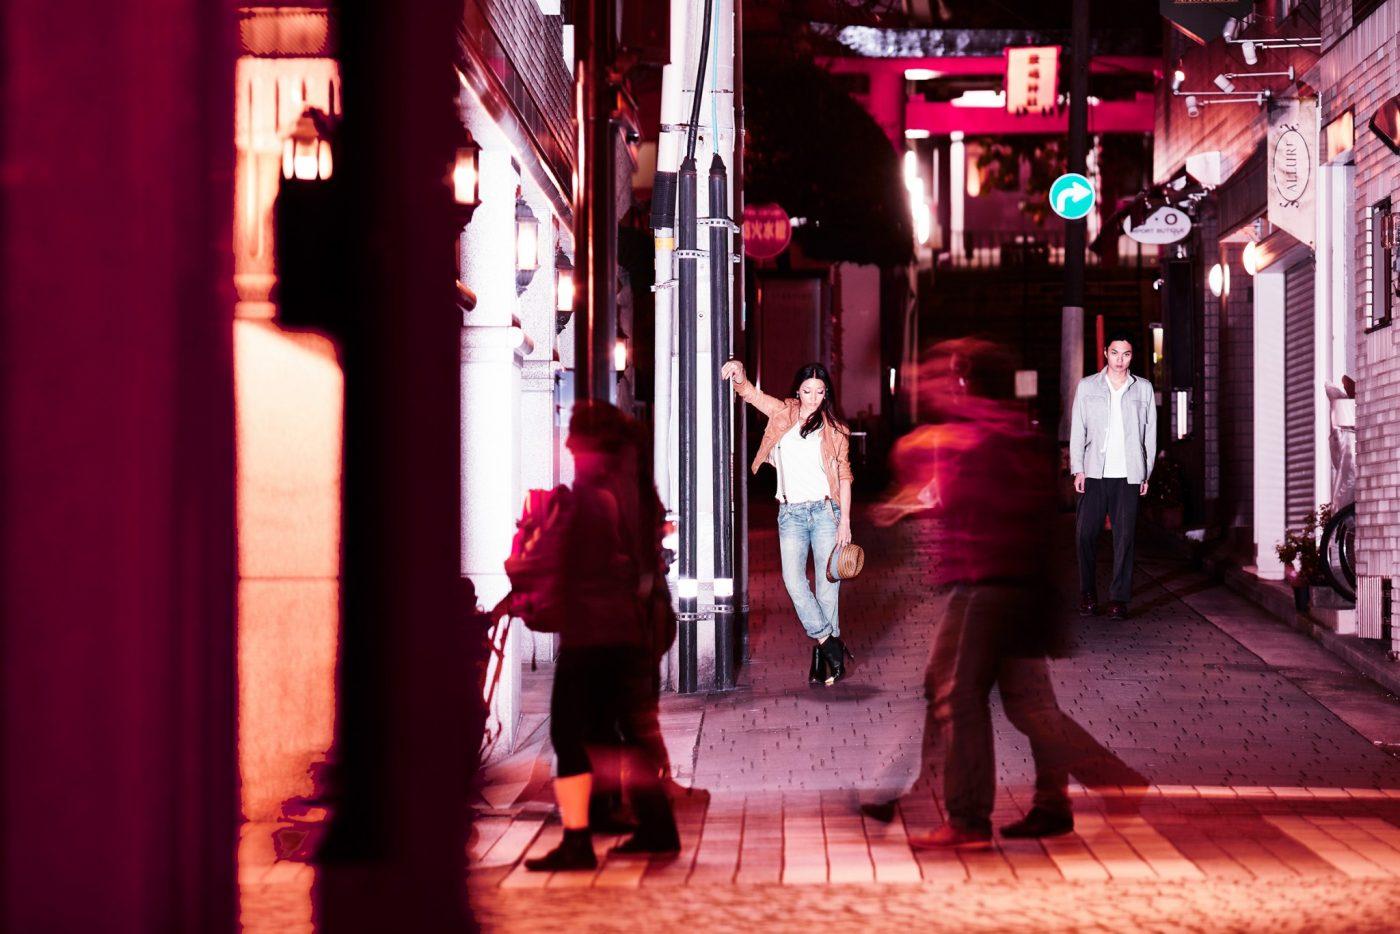 Night in Cherry Red - Japanischer Fotograf Kazunori Nagashima